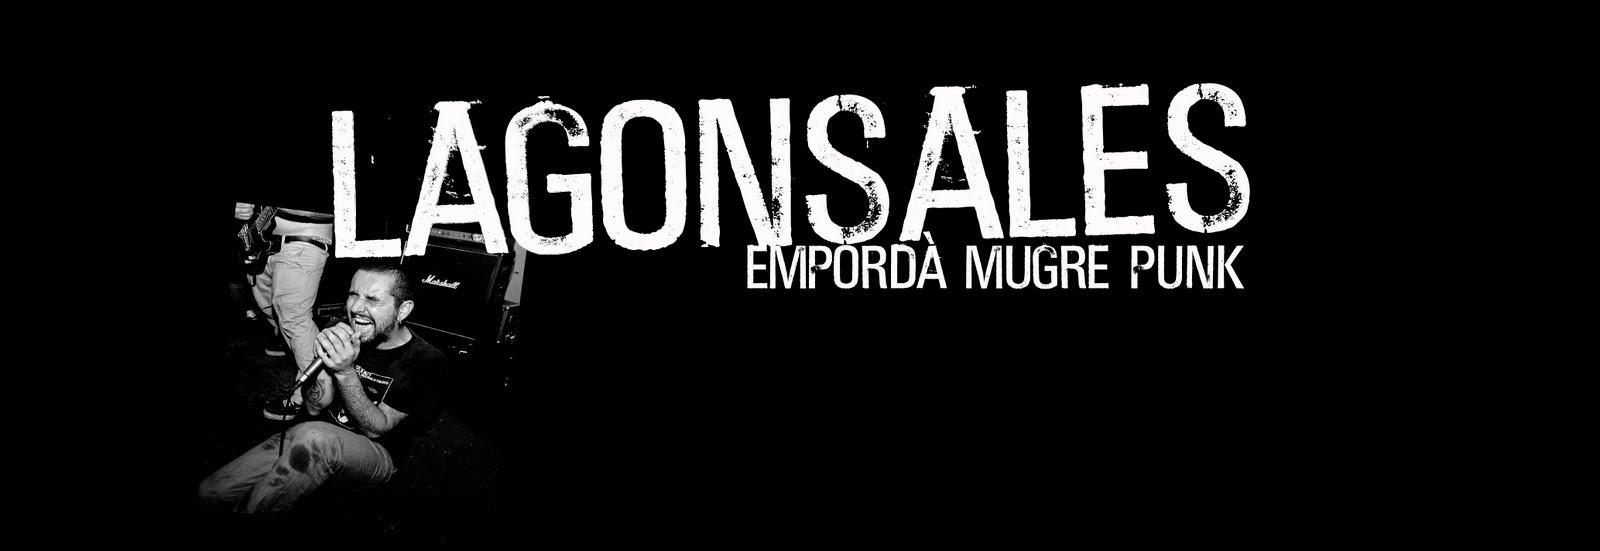 LAGONSALES empordà mugre punk